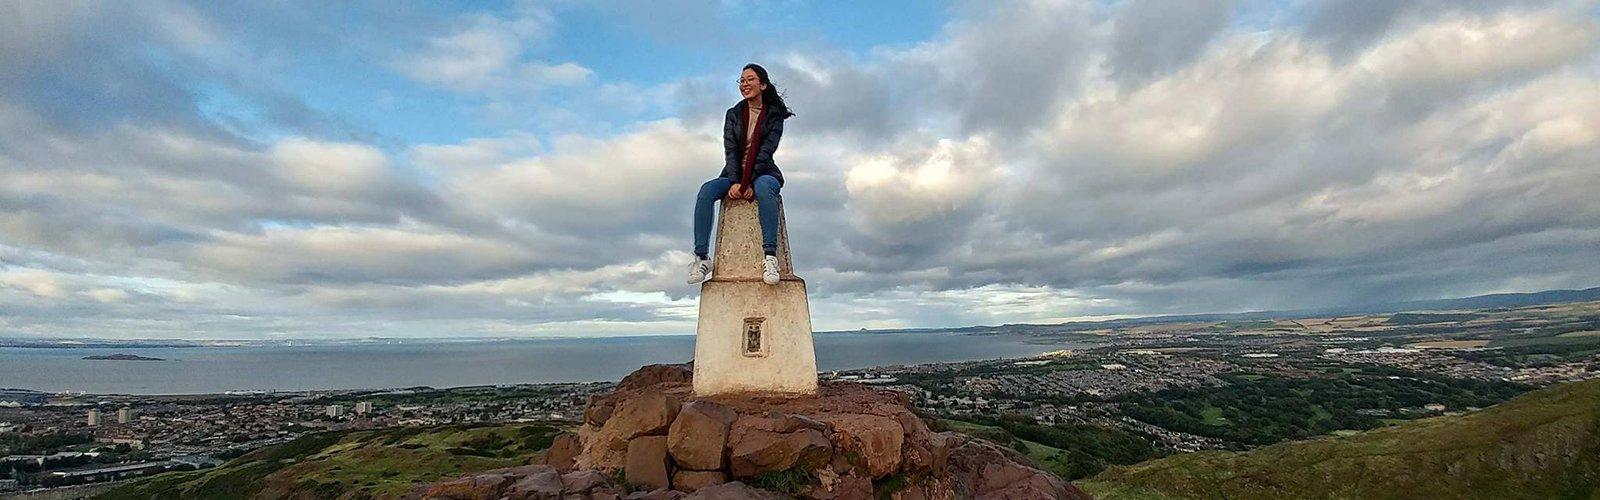 Hye Joon Lee on the top of Arthur's Seat in Edinburgh.